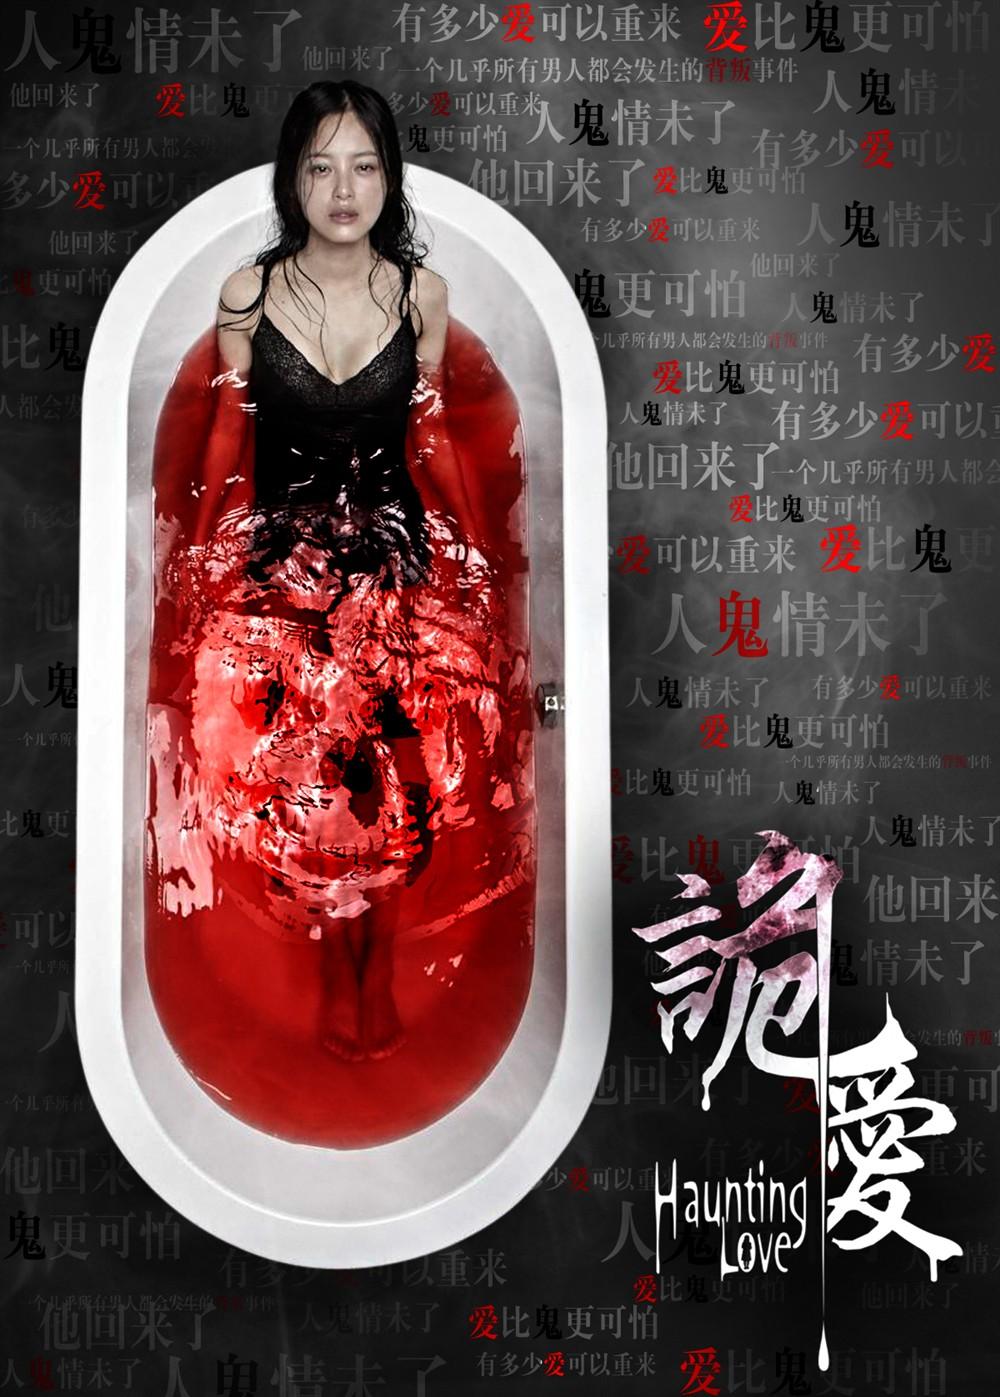 Haunting Love (2012)